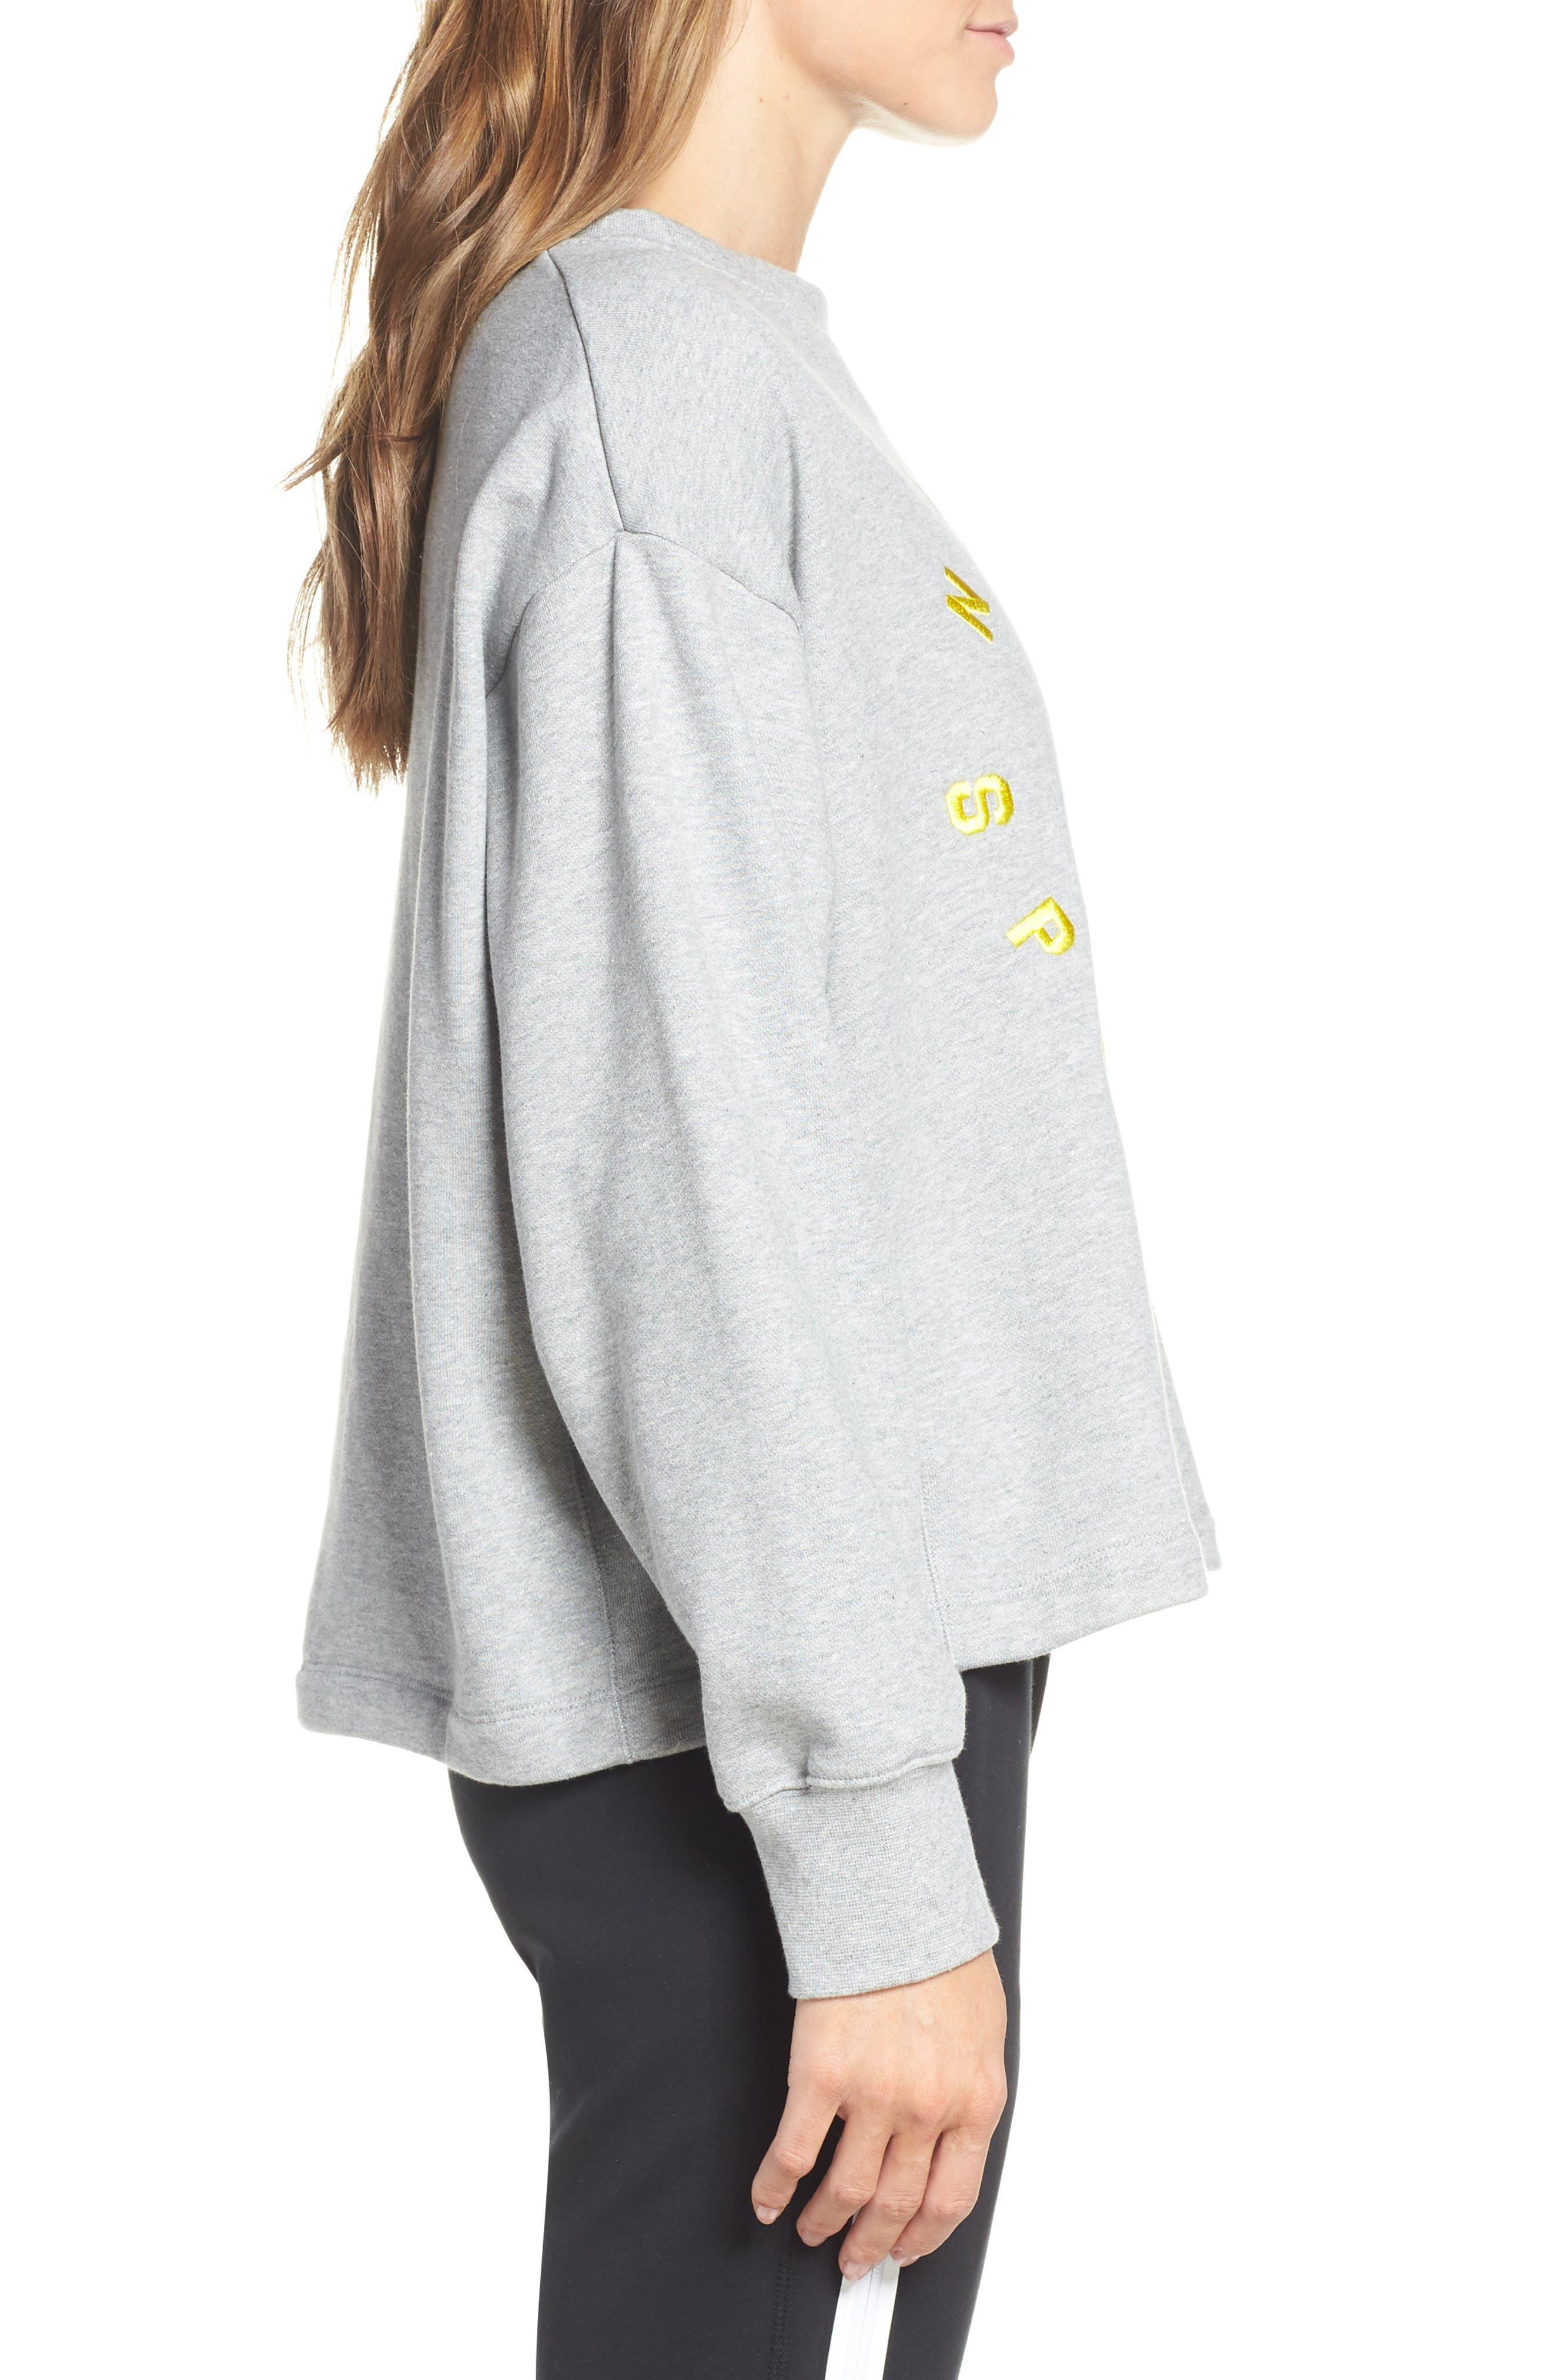 NIKE, Sportswear Logo Oversize Sweatshirt, Alternate thumbnail 4, color, DARK GREY HEATHER